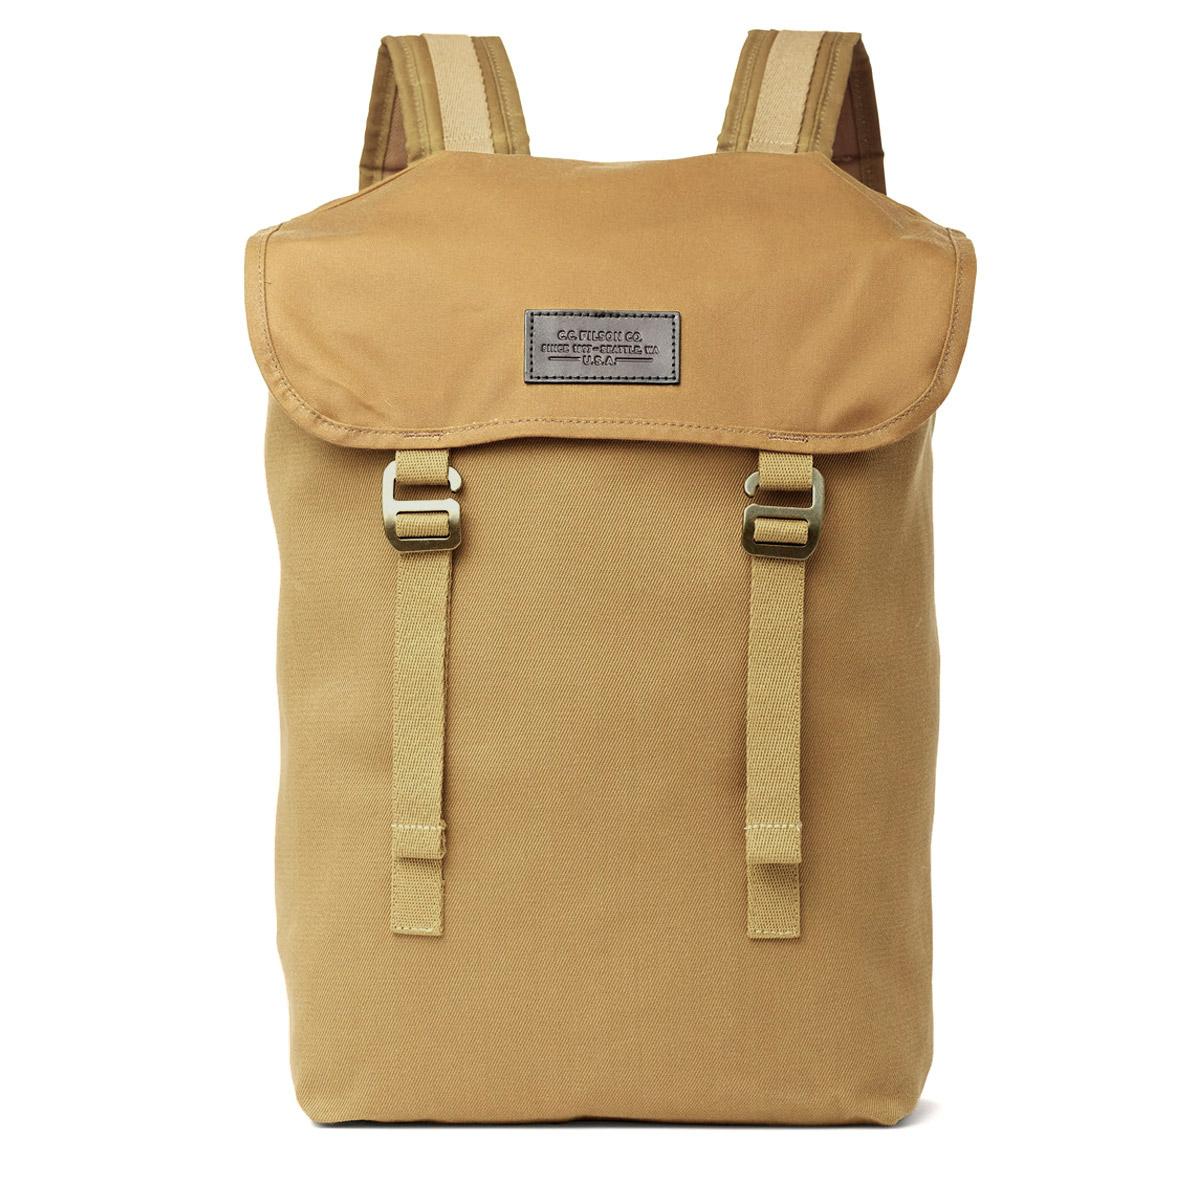 Filson Rugged Twill Ranger Backpack 20137828-Tan